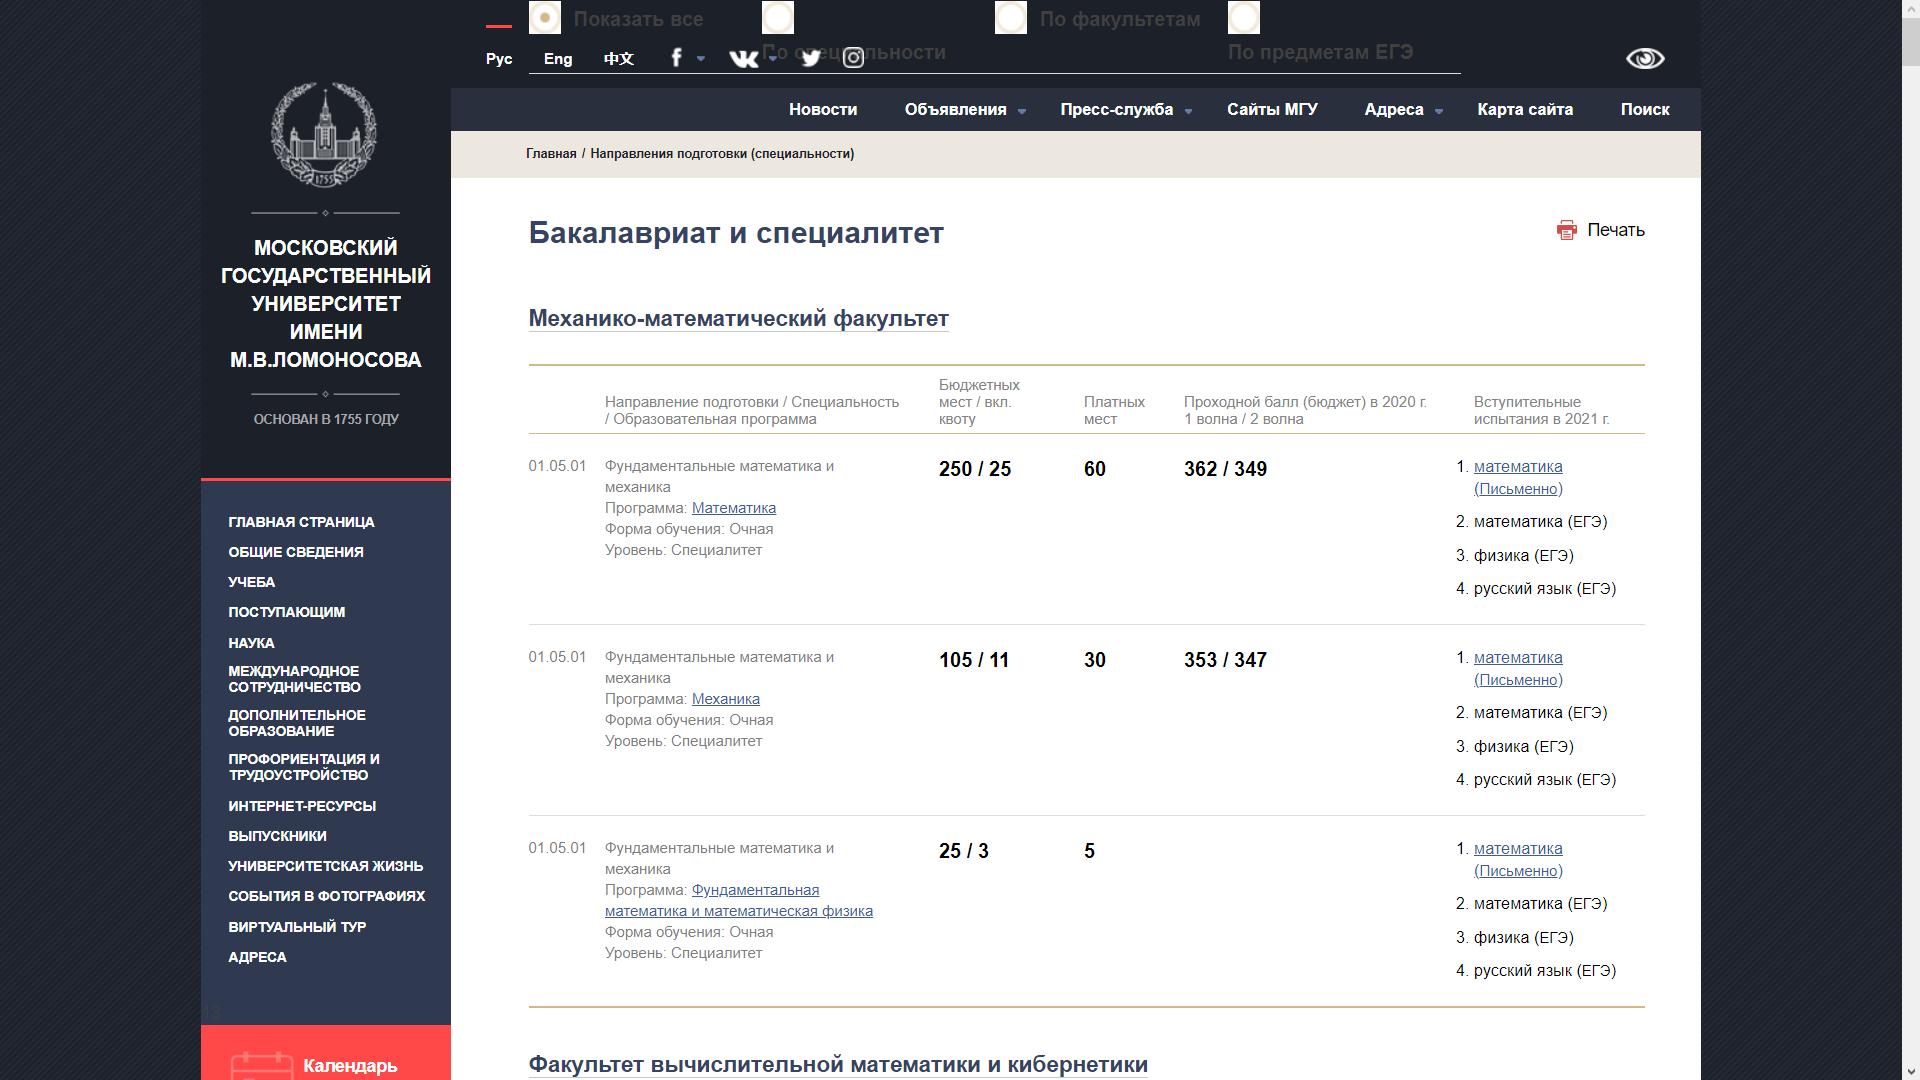 Страница с направлениями подготовки в МГУ им. Ломоносова